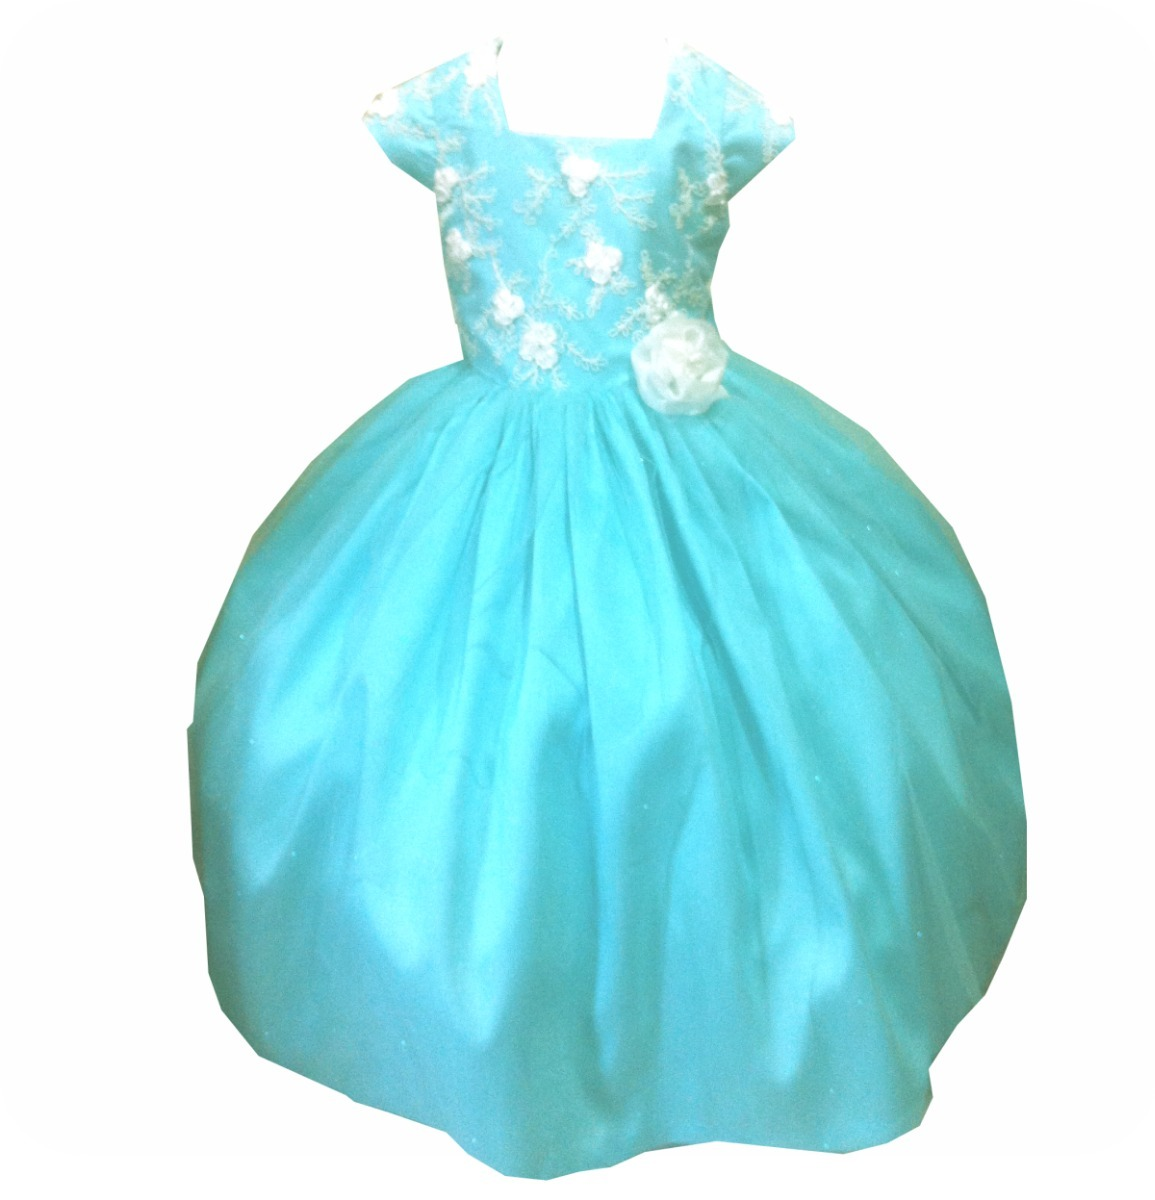 Lindo Vestido De Fiesta Verde Agua -   690.00 en Mercado Libre 38c8ba0c7e4f